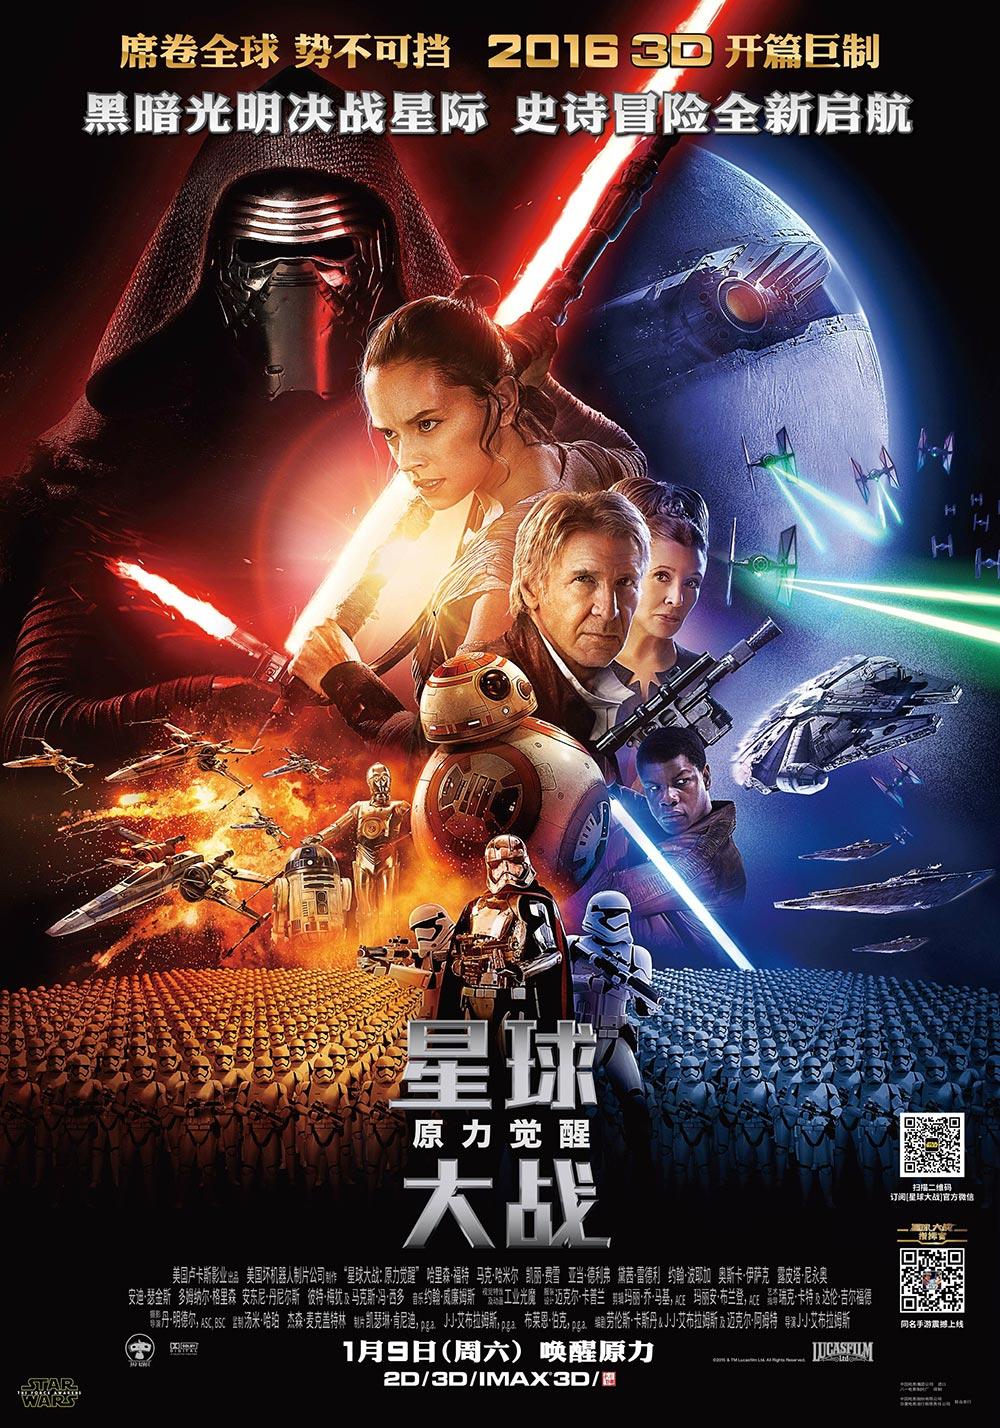 Star Wars China Poster Shrinks Black Character Variety